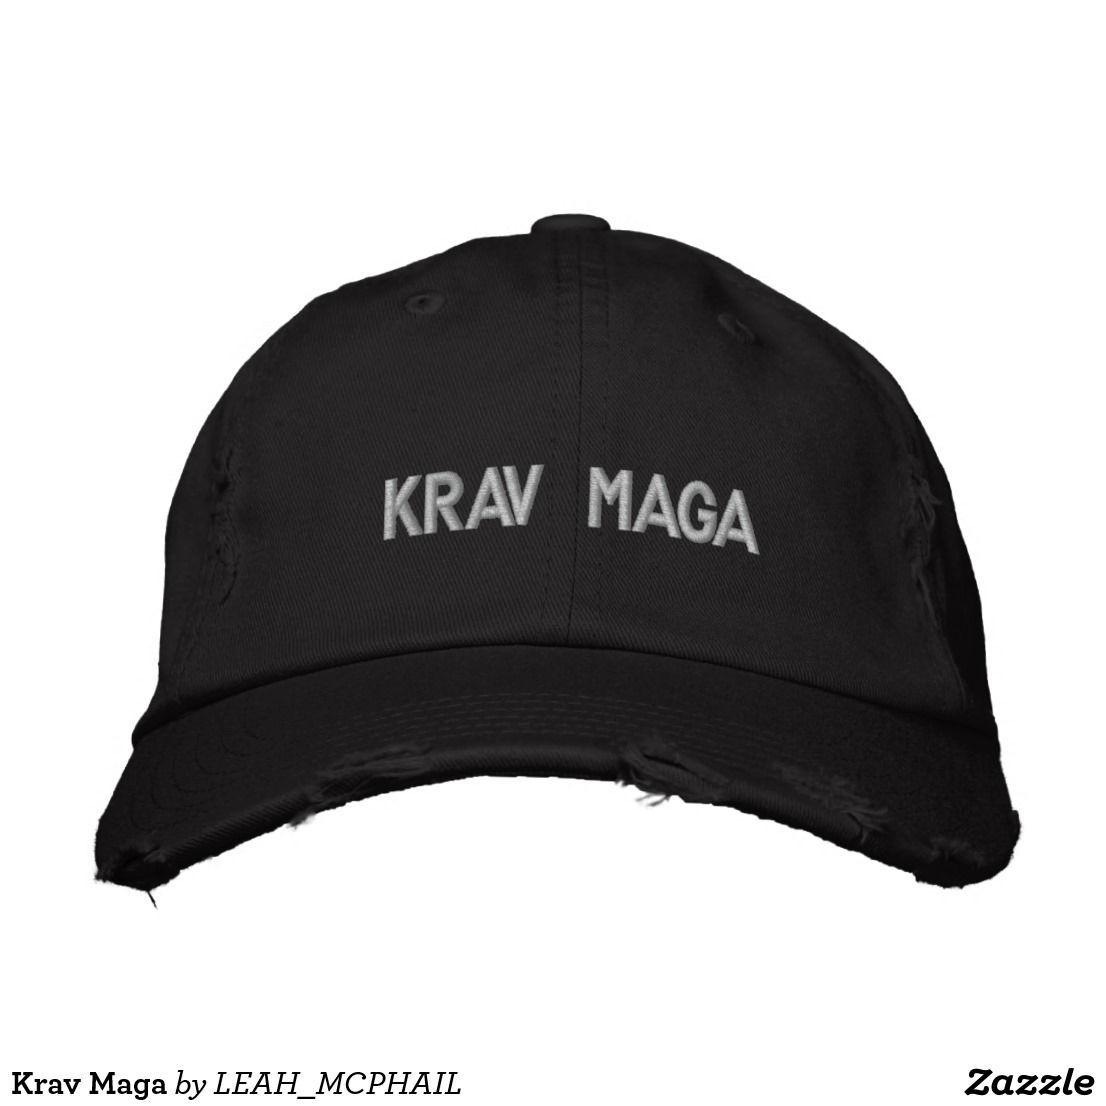 a0da7a73ae3c4 Krav Maga Custom Embroidered Hats